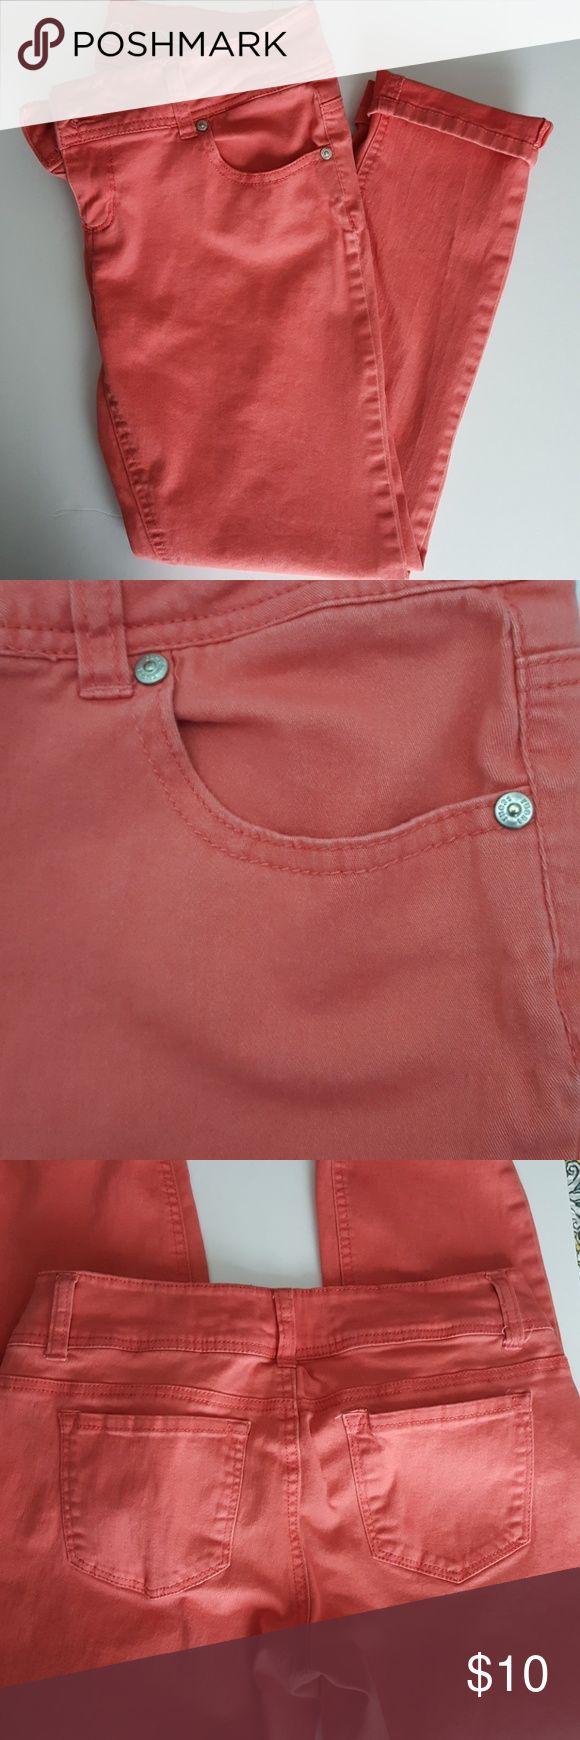 Coral Capri pants 98% cotton, 2% spandex. Very comfortable! Good used condition. Size 9/10. Pants Capris